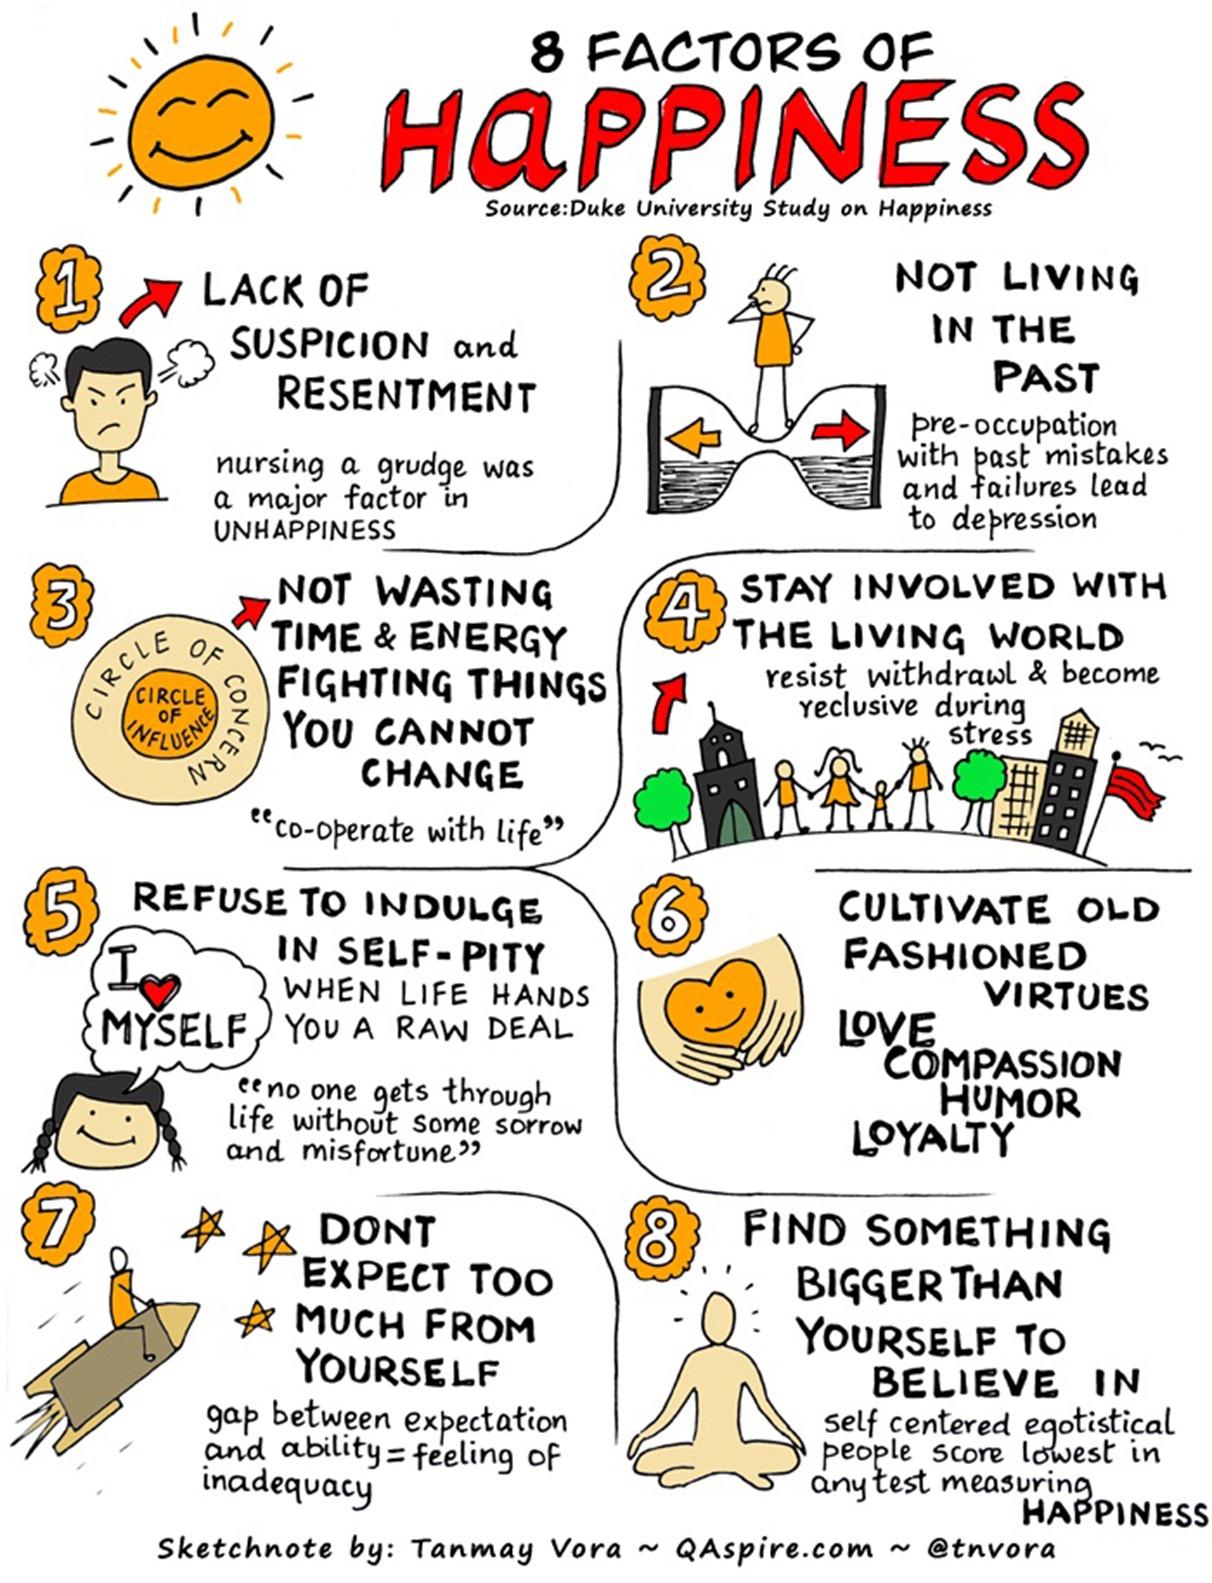 8 factors of happiness